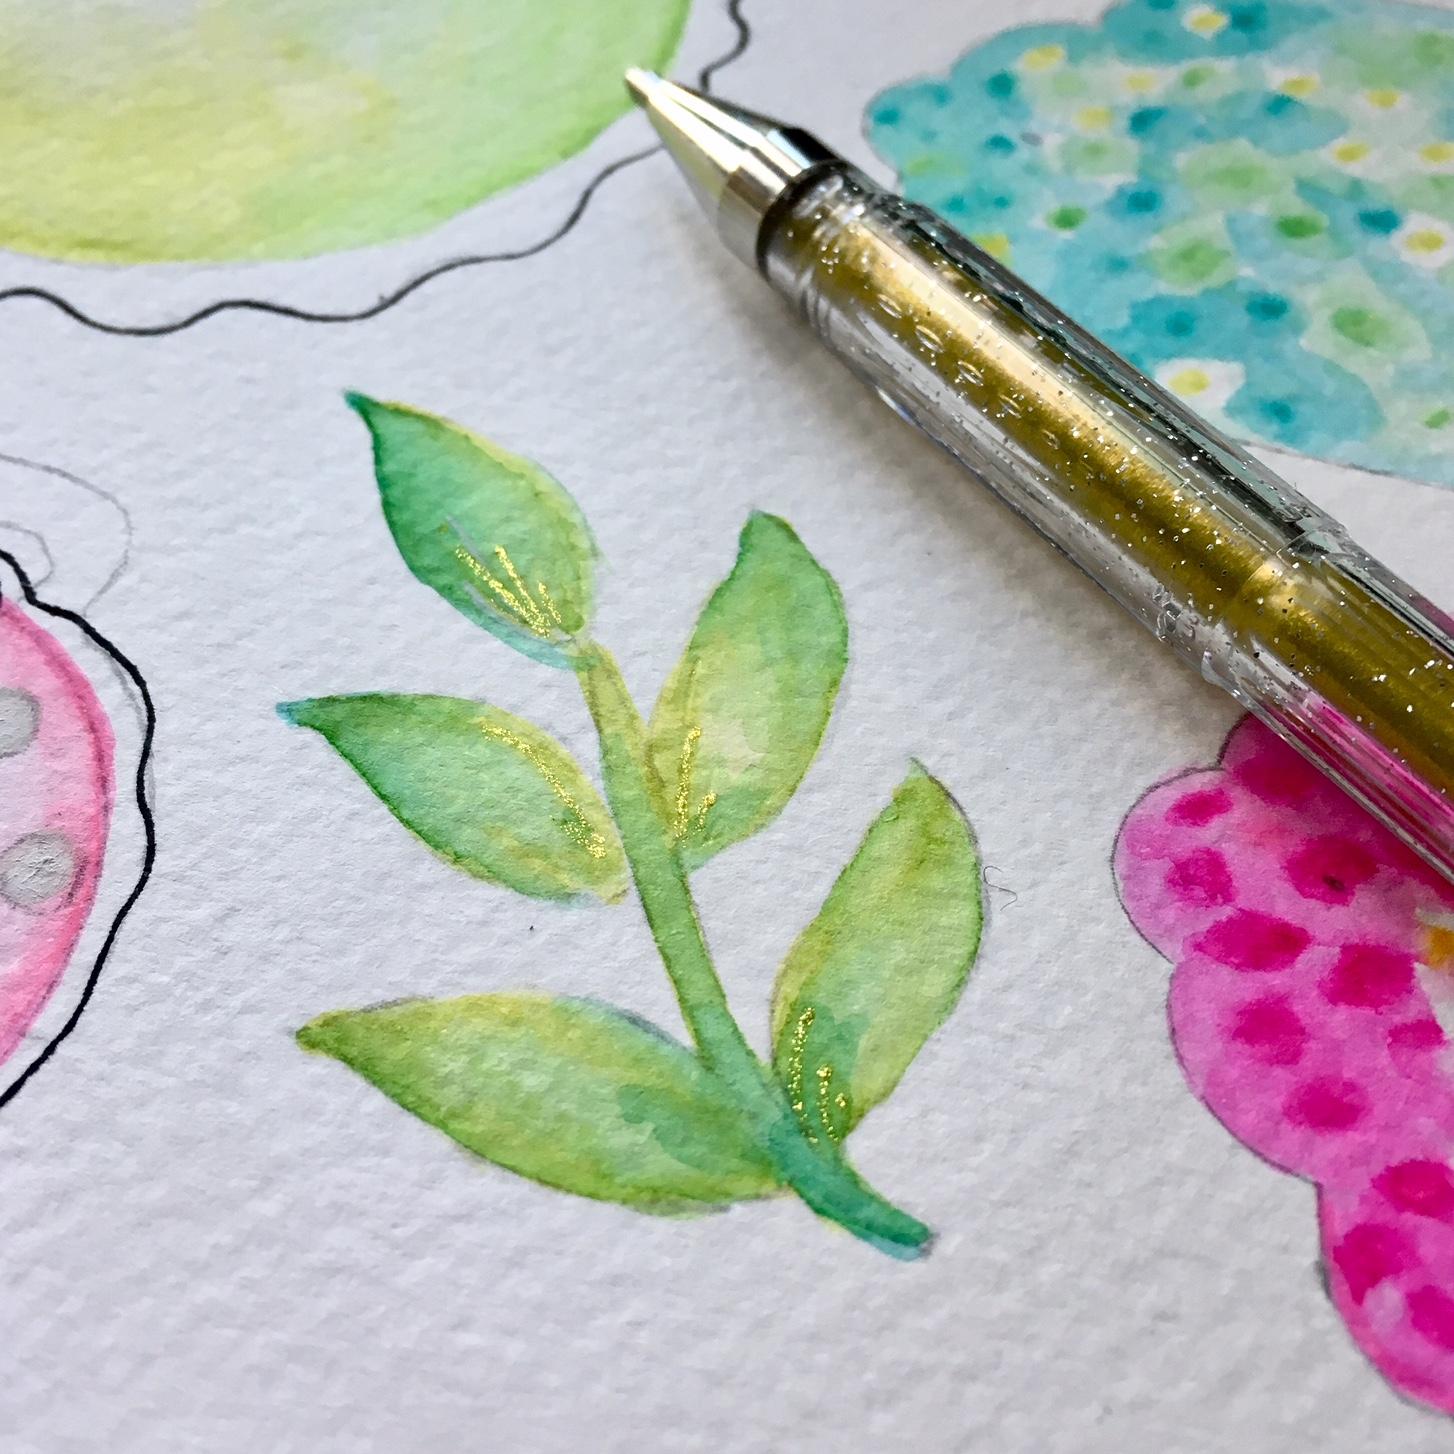 DIY scrapbook embellishments - finishing with glitter